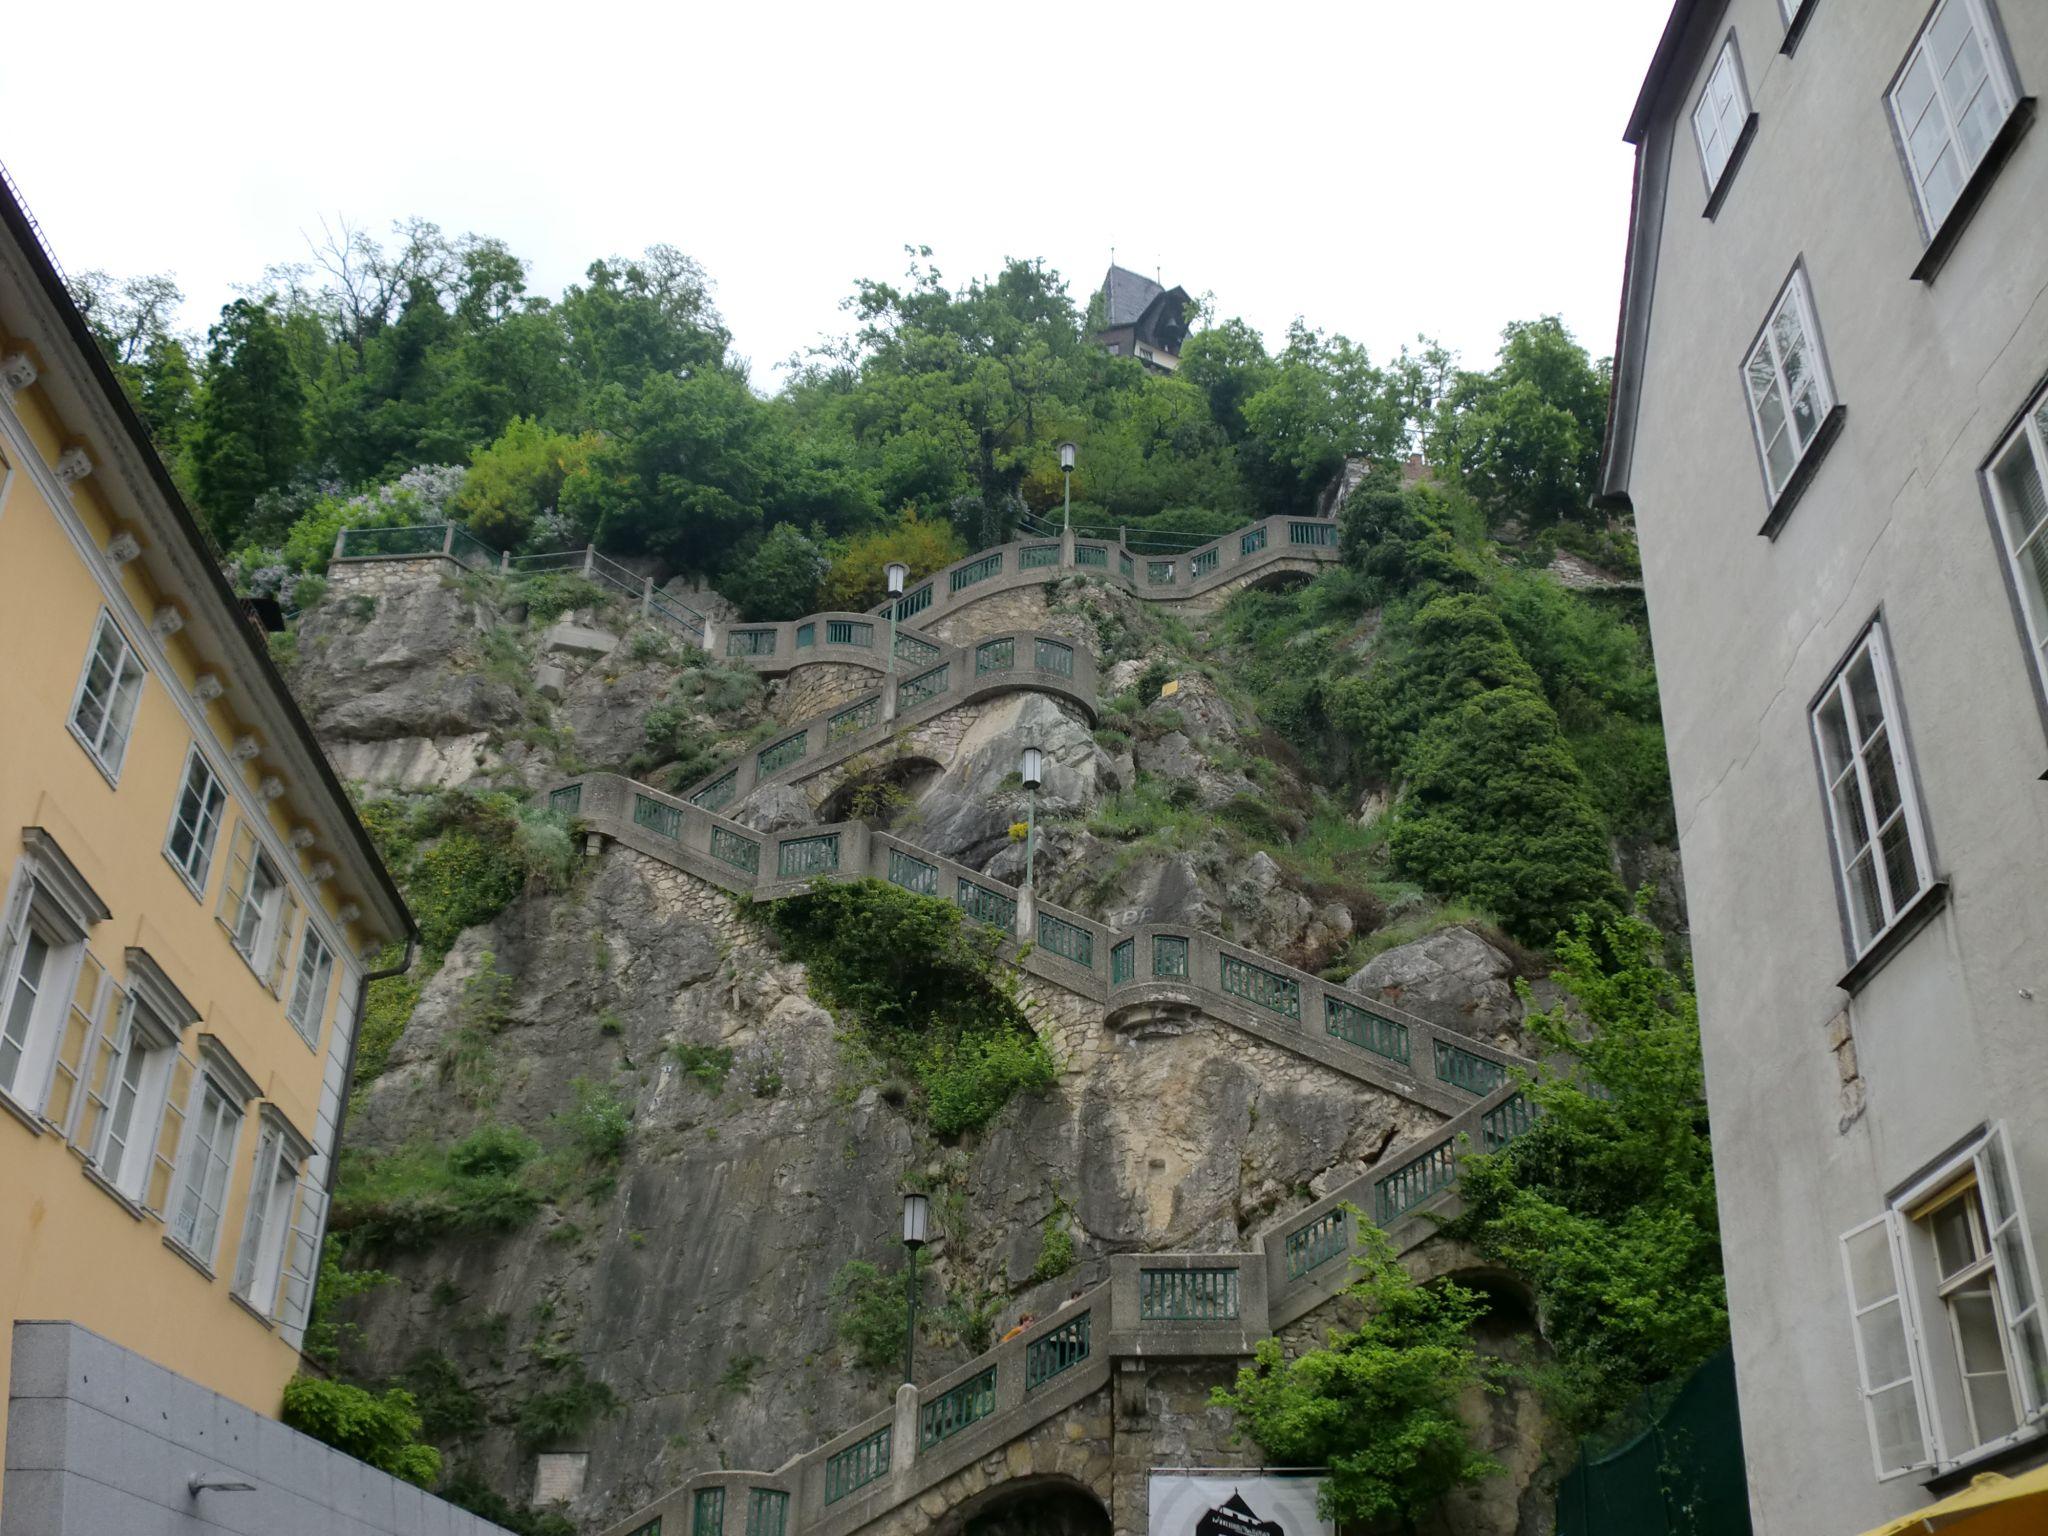 Graz hill - Graz: tradition and modernity